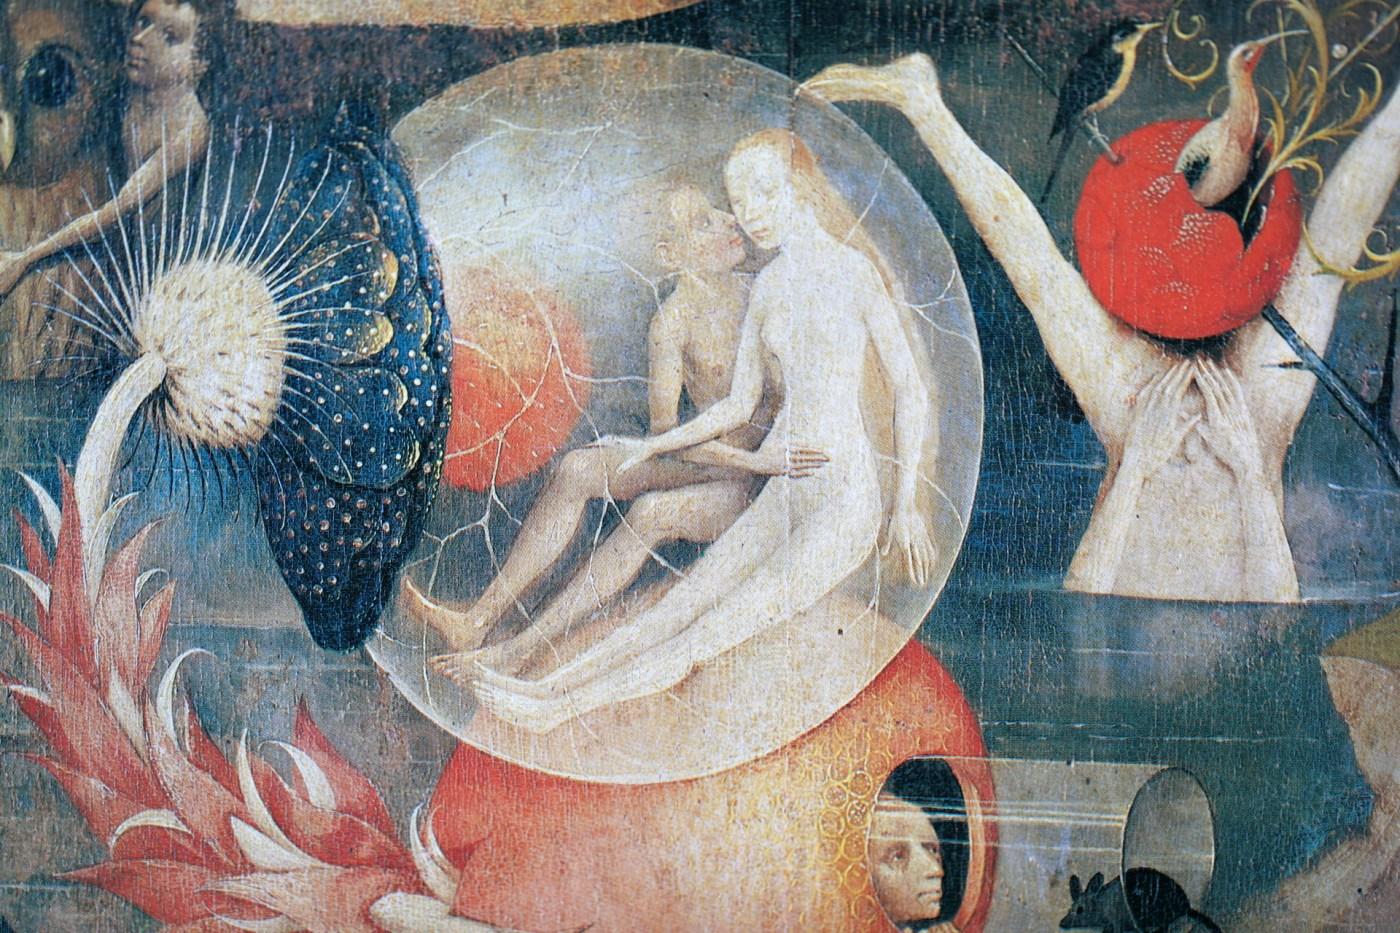 Hieronymus Bosch Ausschnitt Garten 2